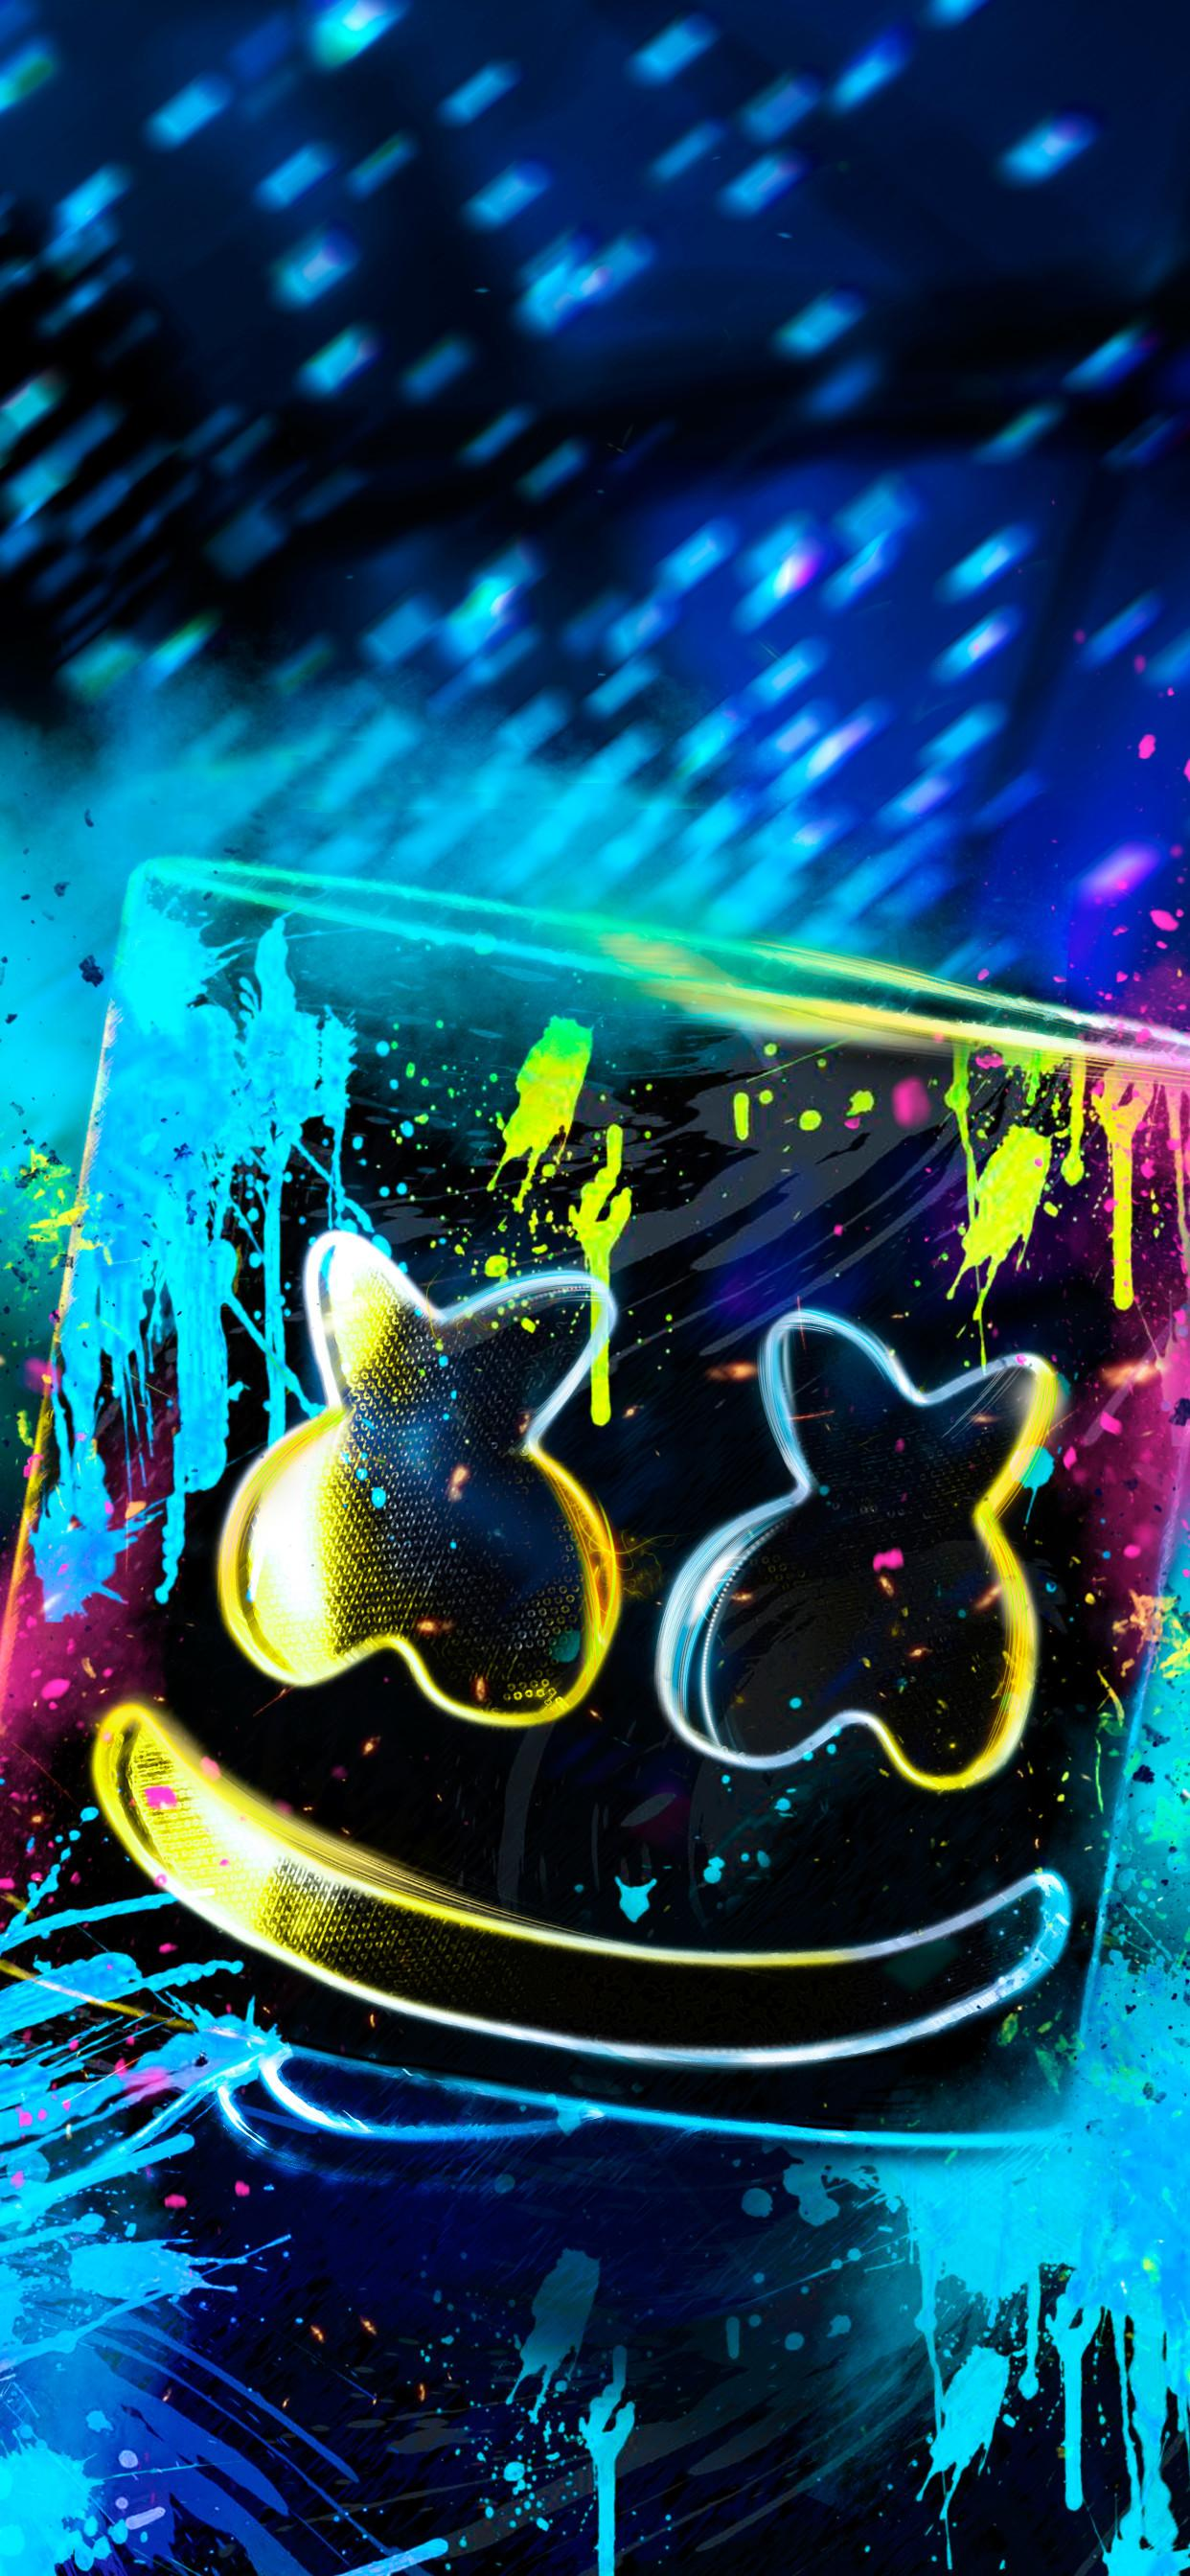 4k Resolution Neon Wallpaper Hd August 2014